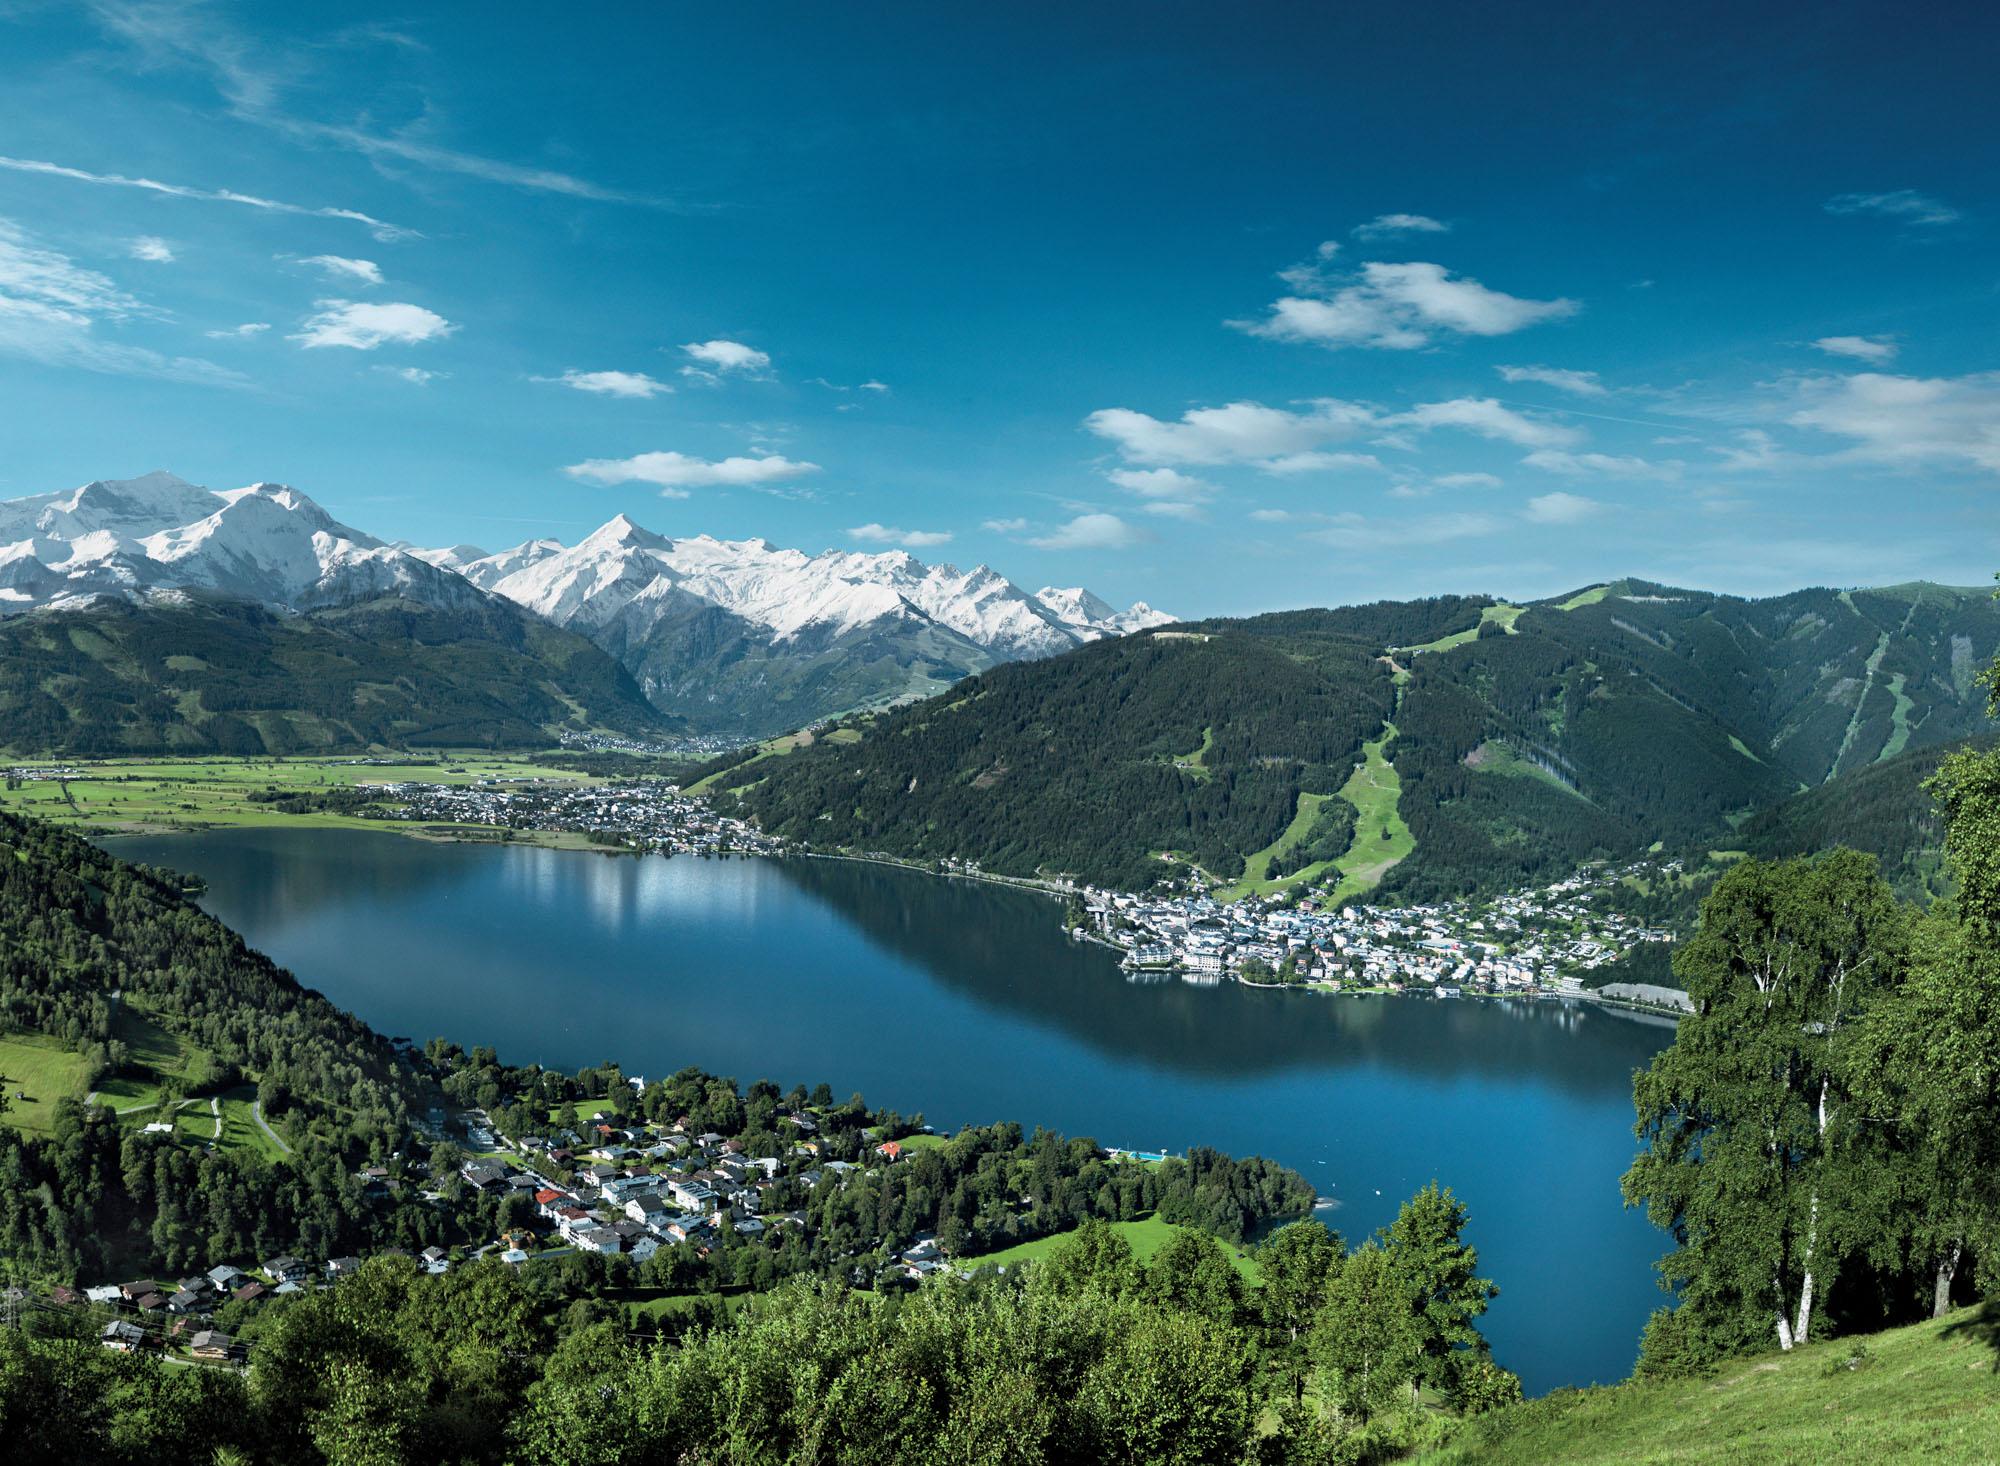 Fotospot österreich, fotospot salzburger land